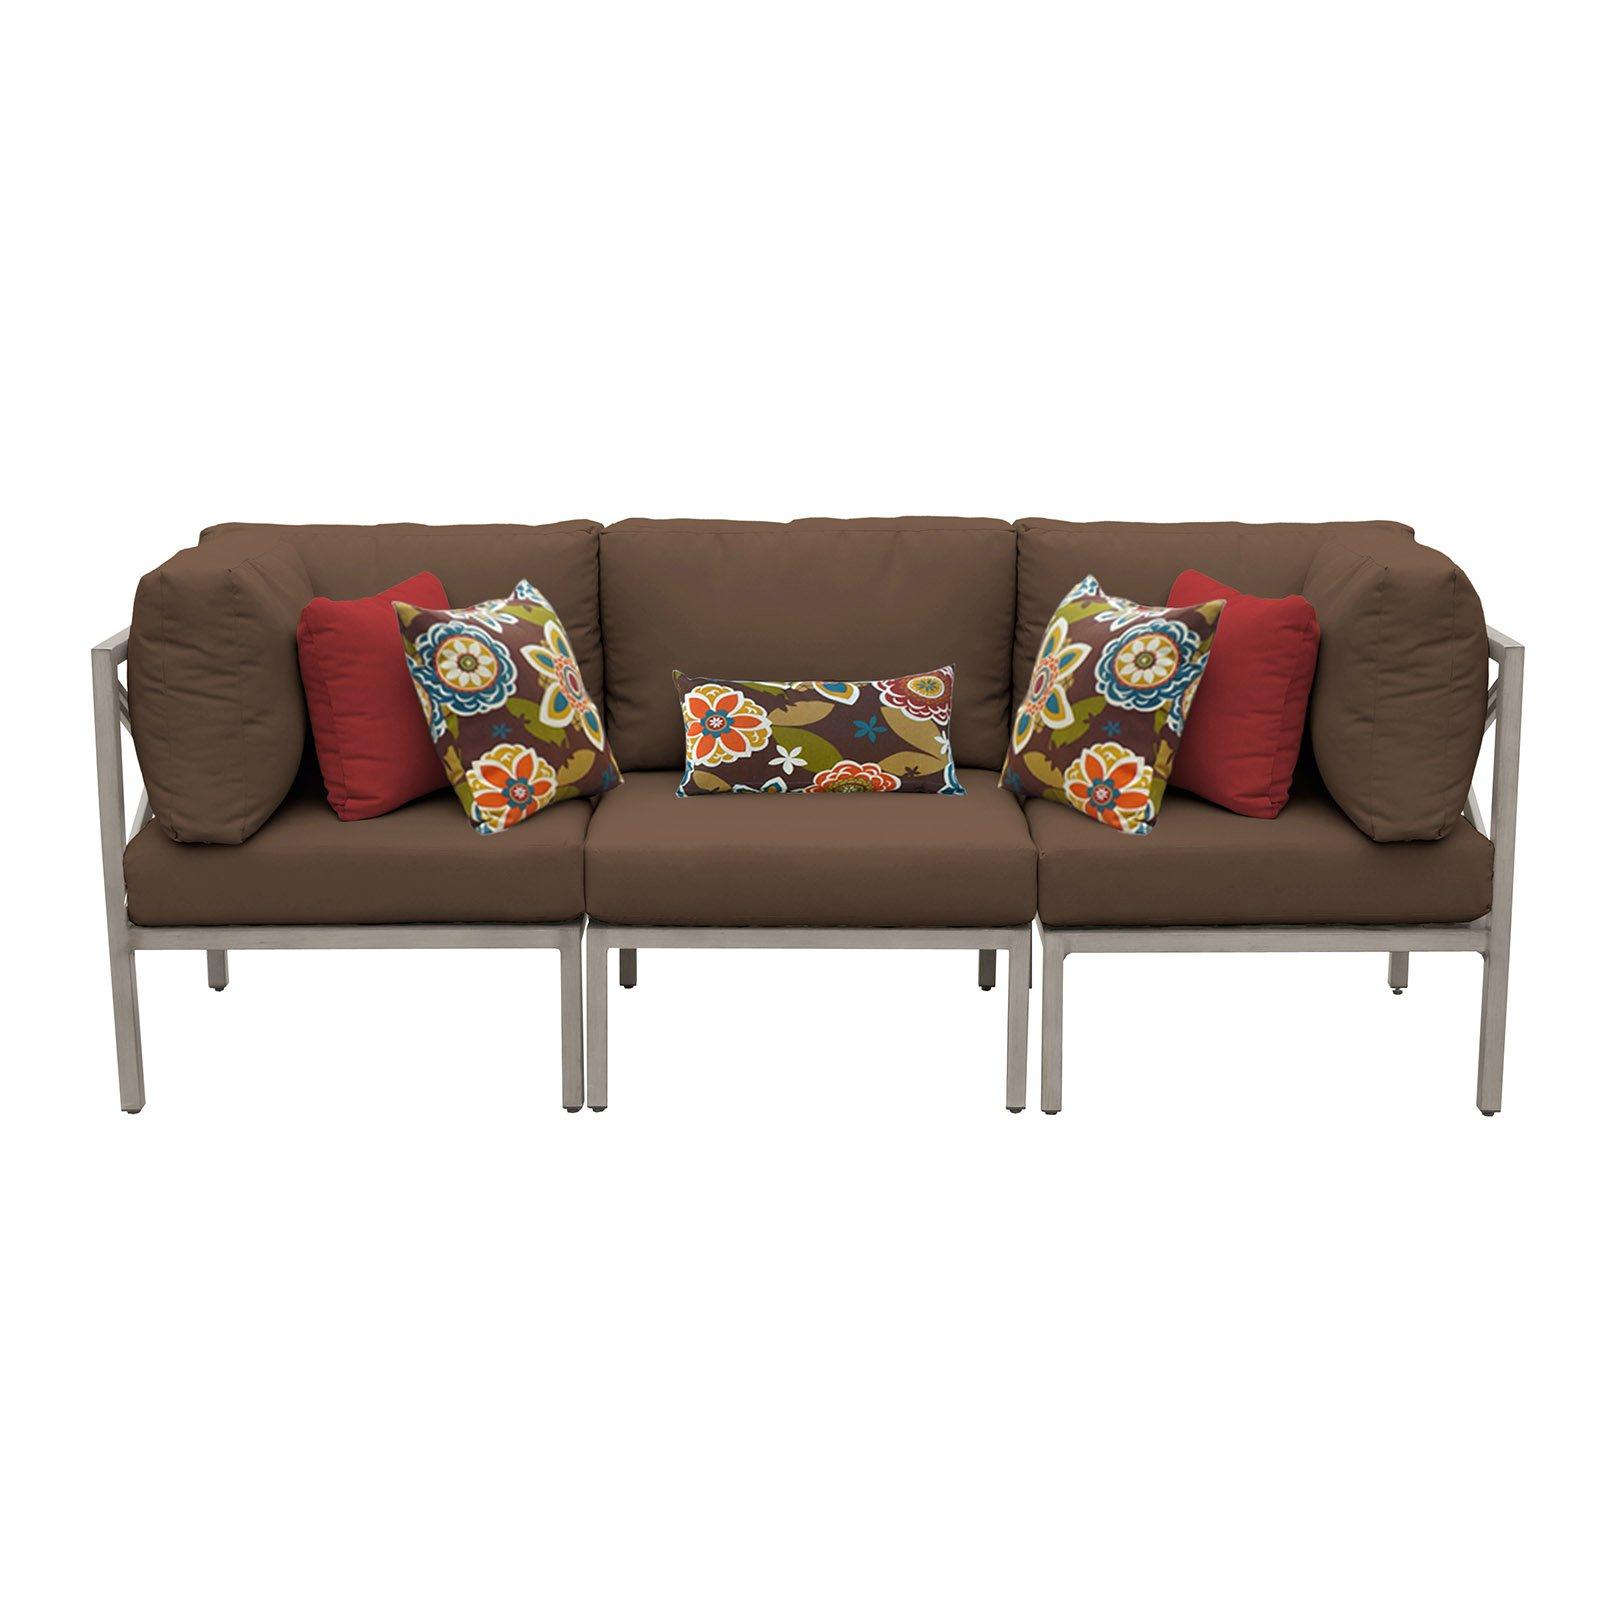 Tk Classics Carlisle Aluminum 3 Piece Patio Sofa Throughout 2020 Carlisle Patio Sofas With Cushions (View 23 of 25)